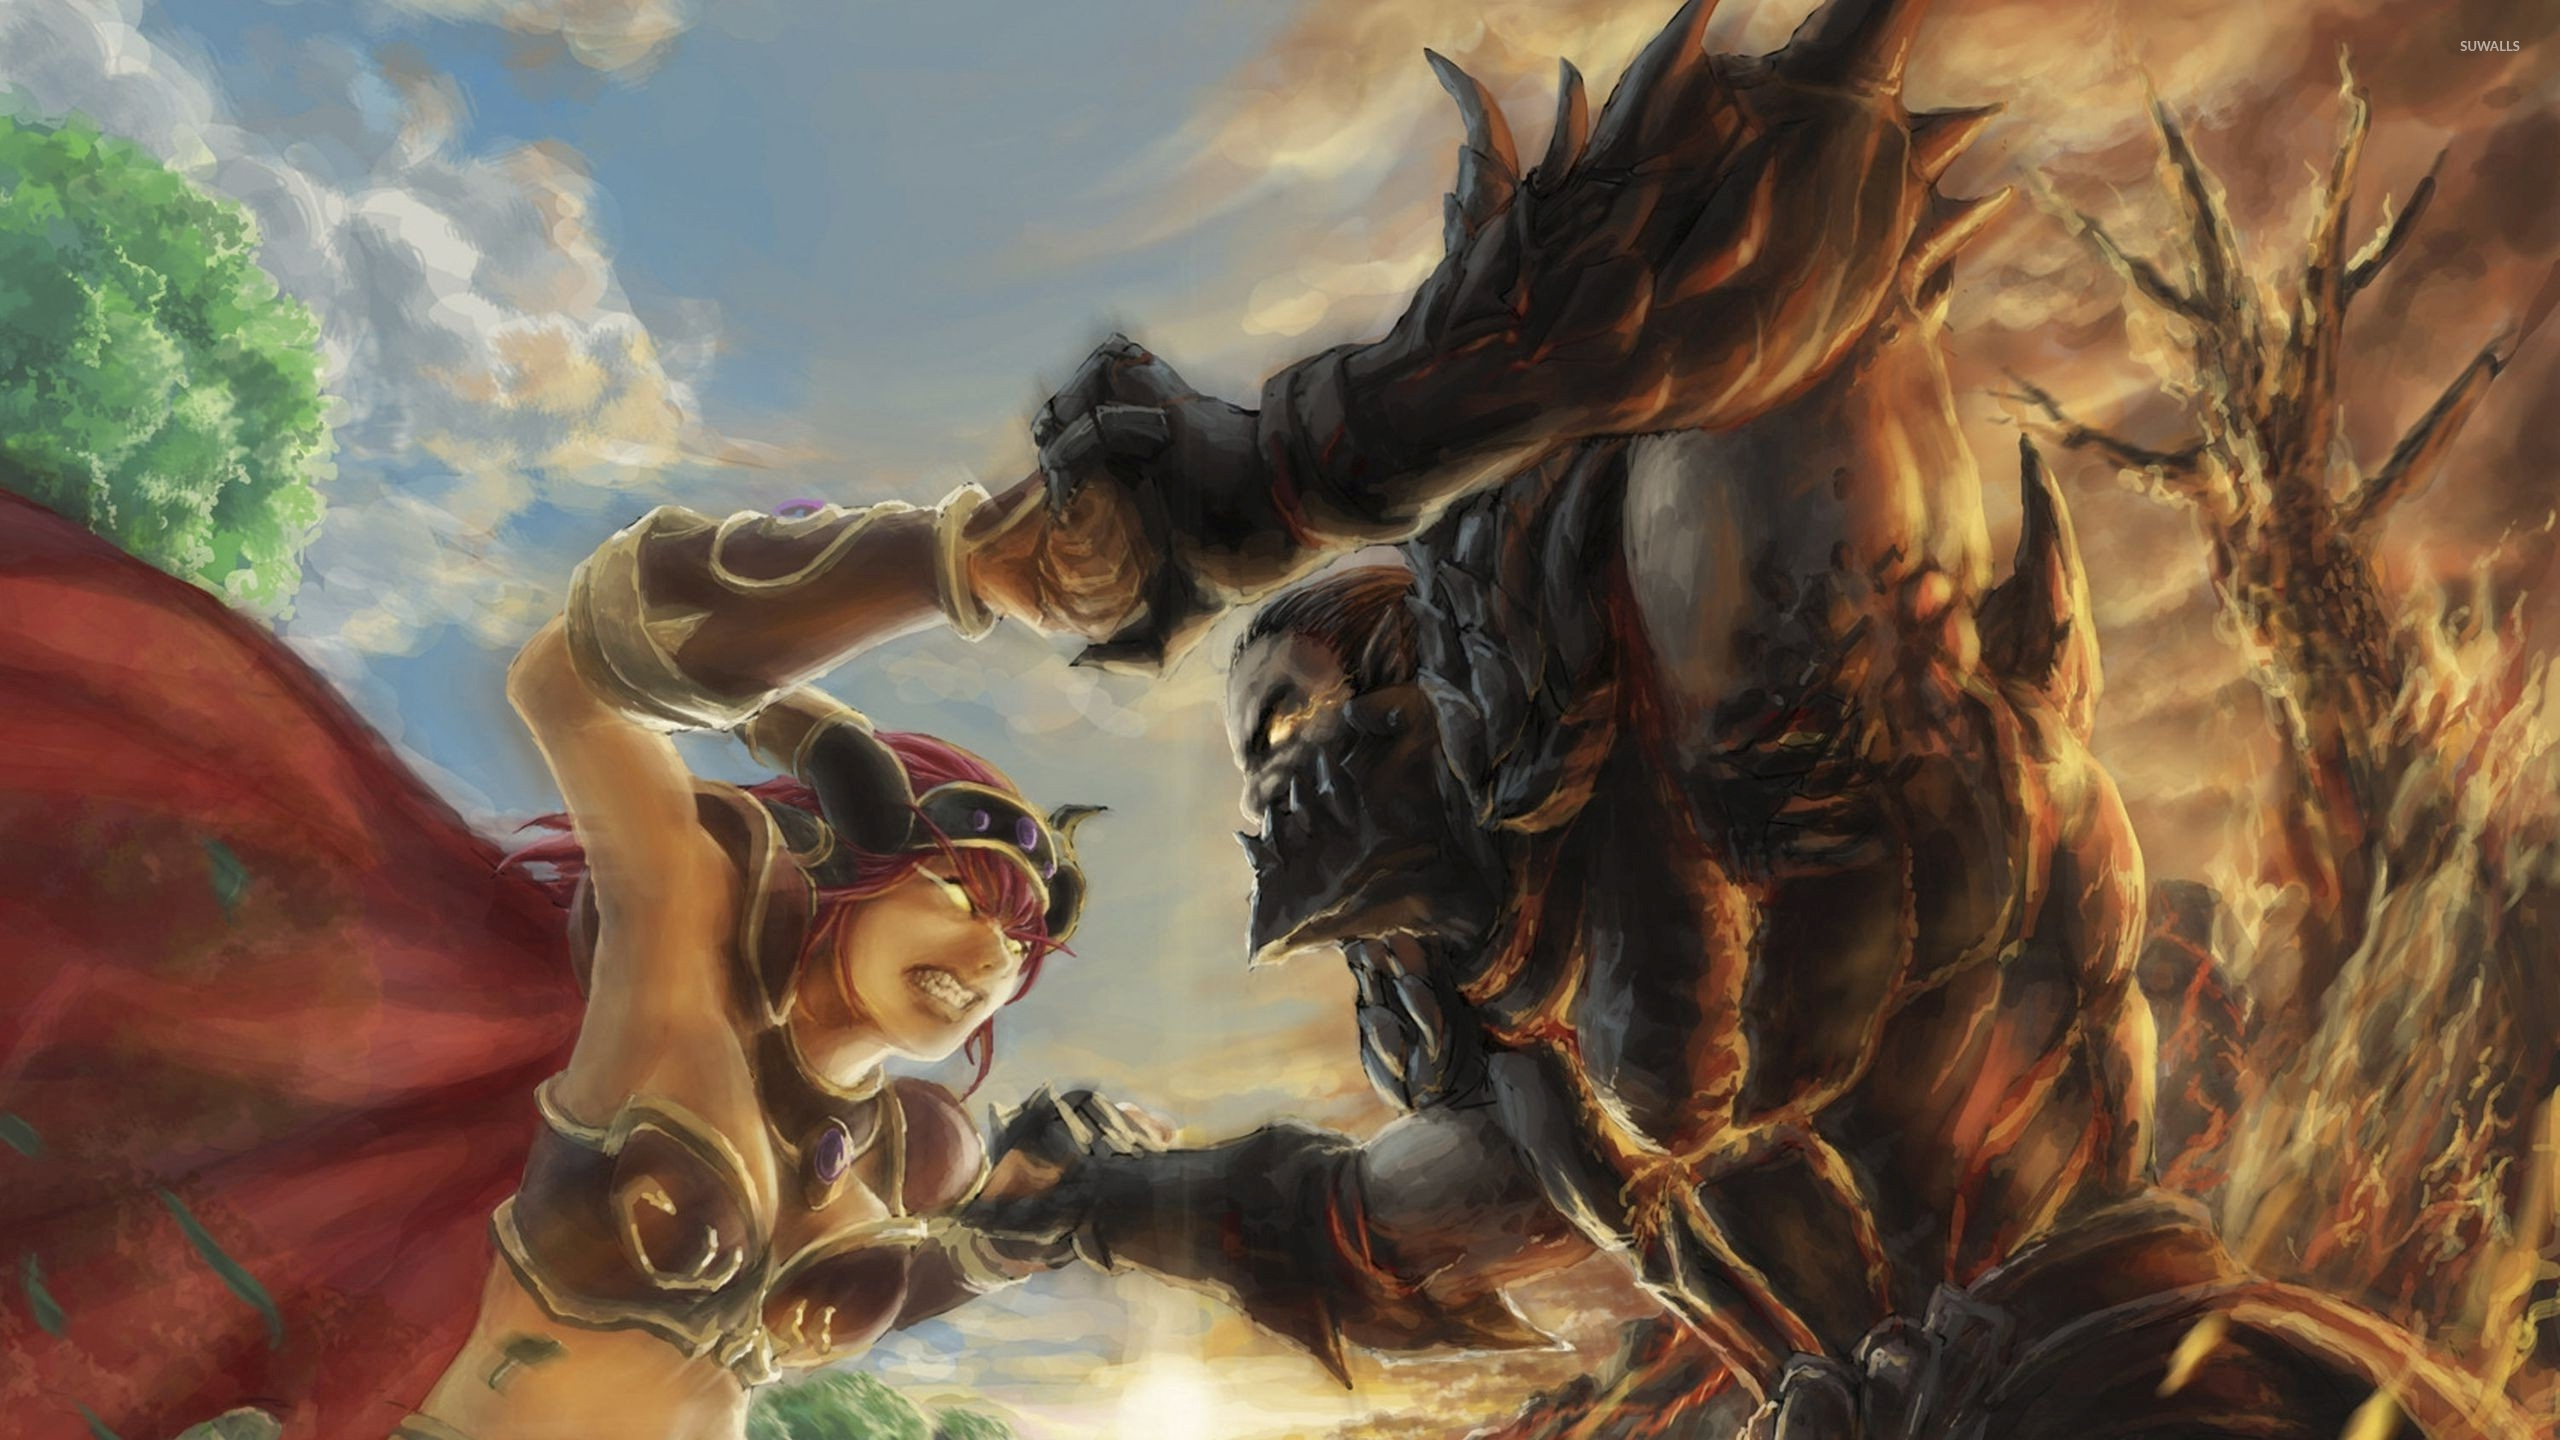 World Of Warcraft 16 Wallpaper Game Wallpapers 42540